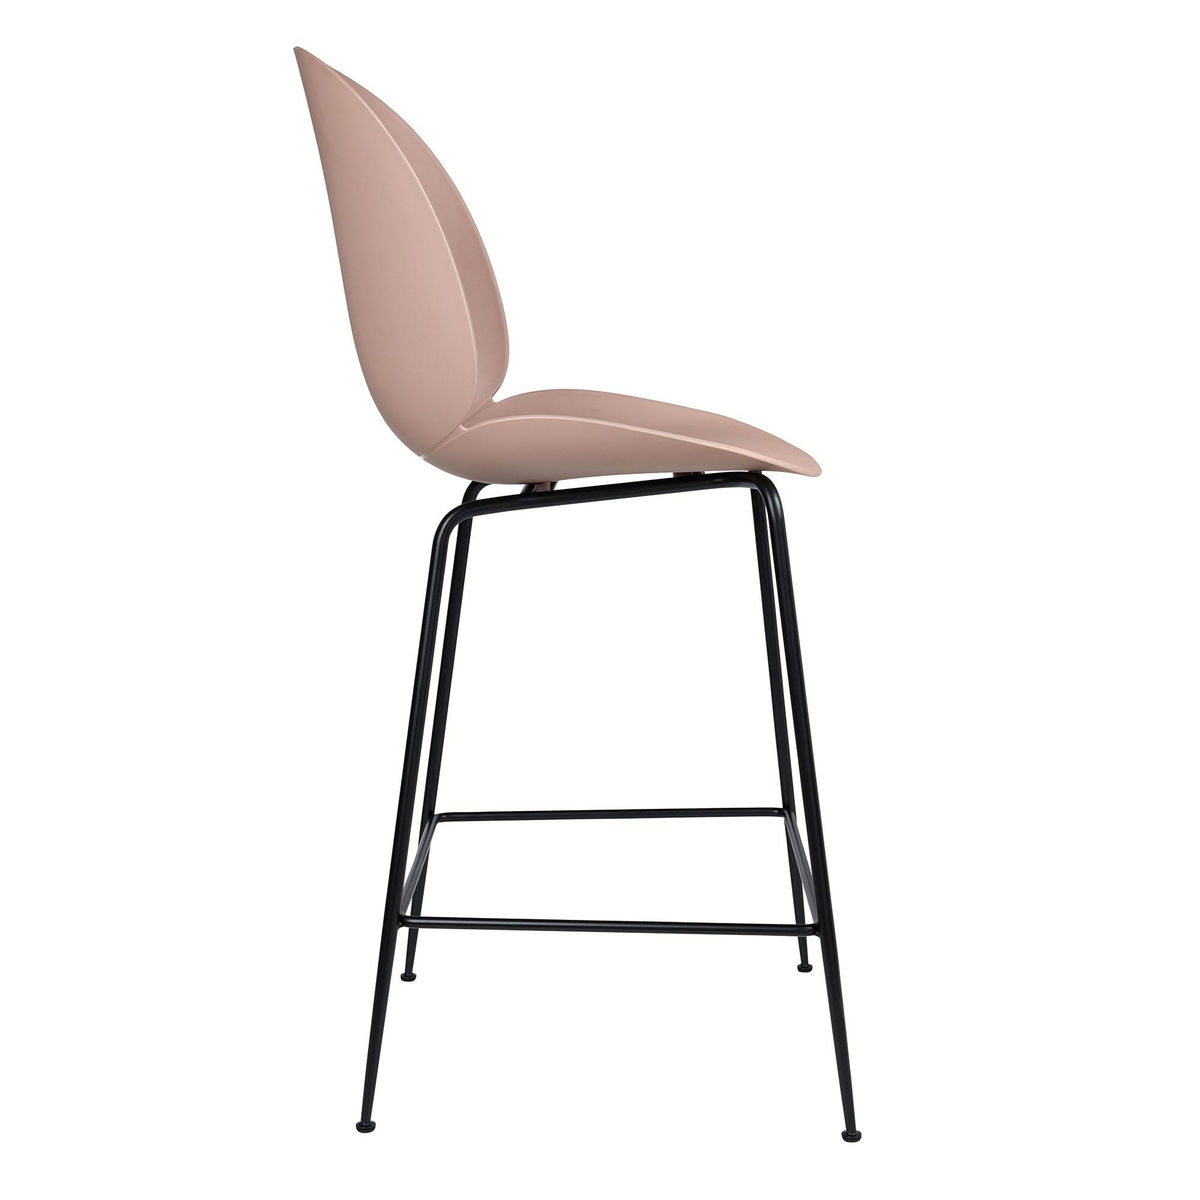 Beetle counter chair barhocker schwarz 108cm gubi for Barhocker 92 cm